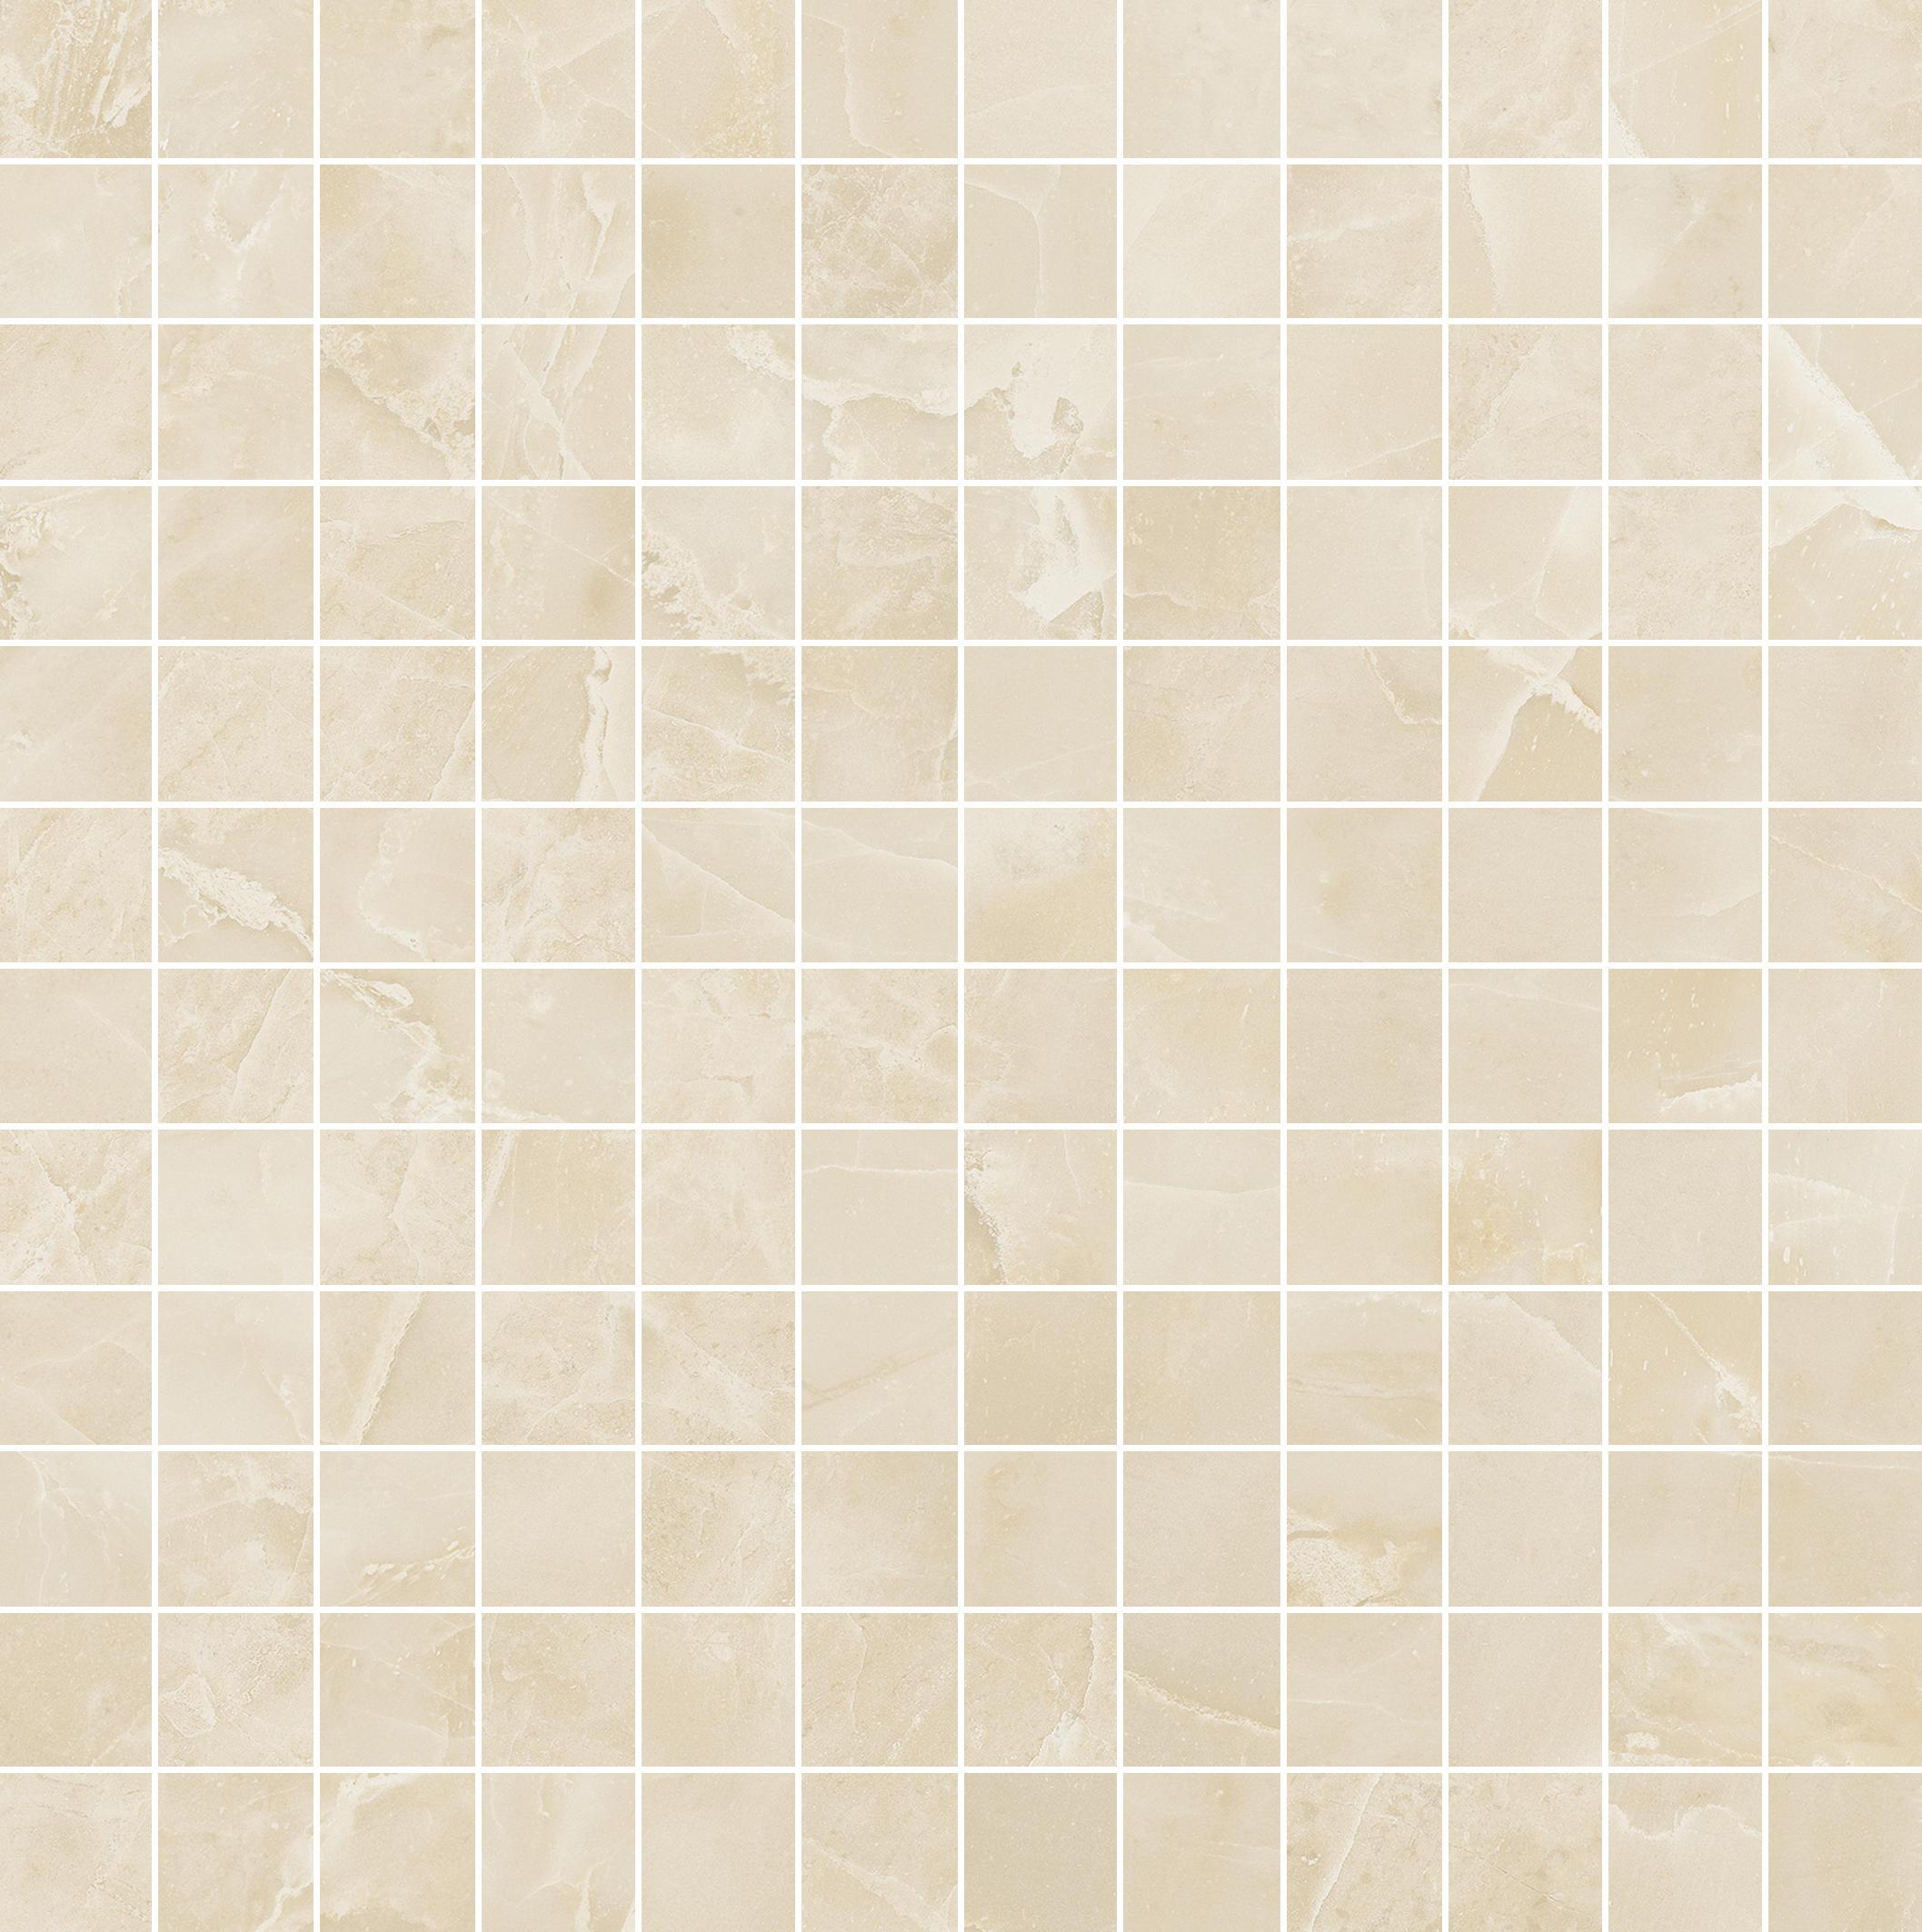 Mosaico 144 Royal Jw 03 Ceramic Tiles From Mirage Architonic